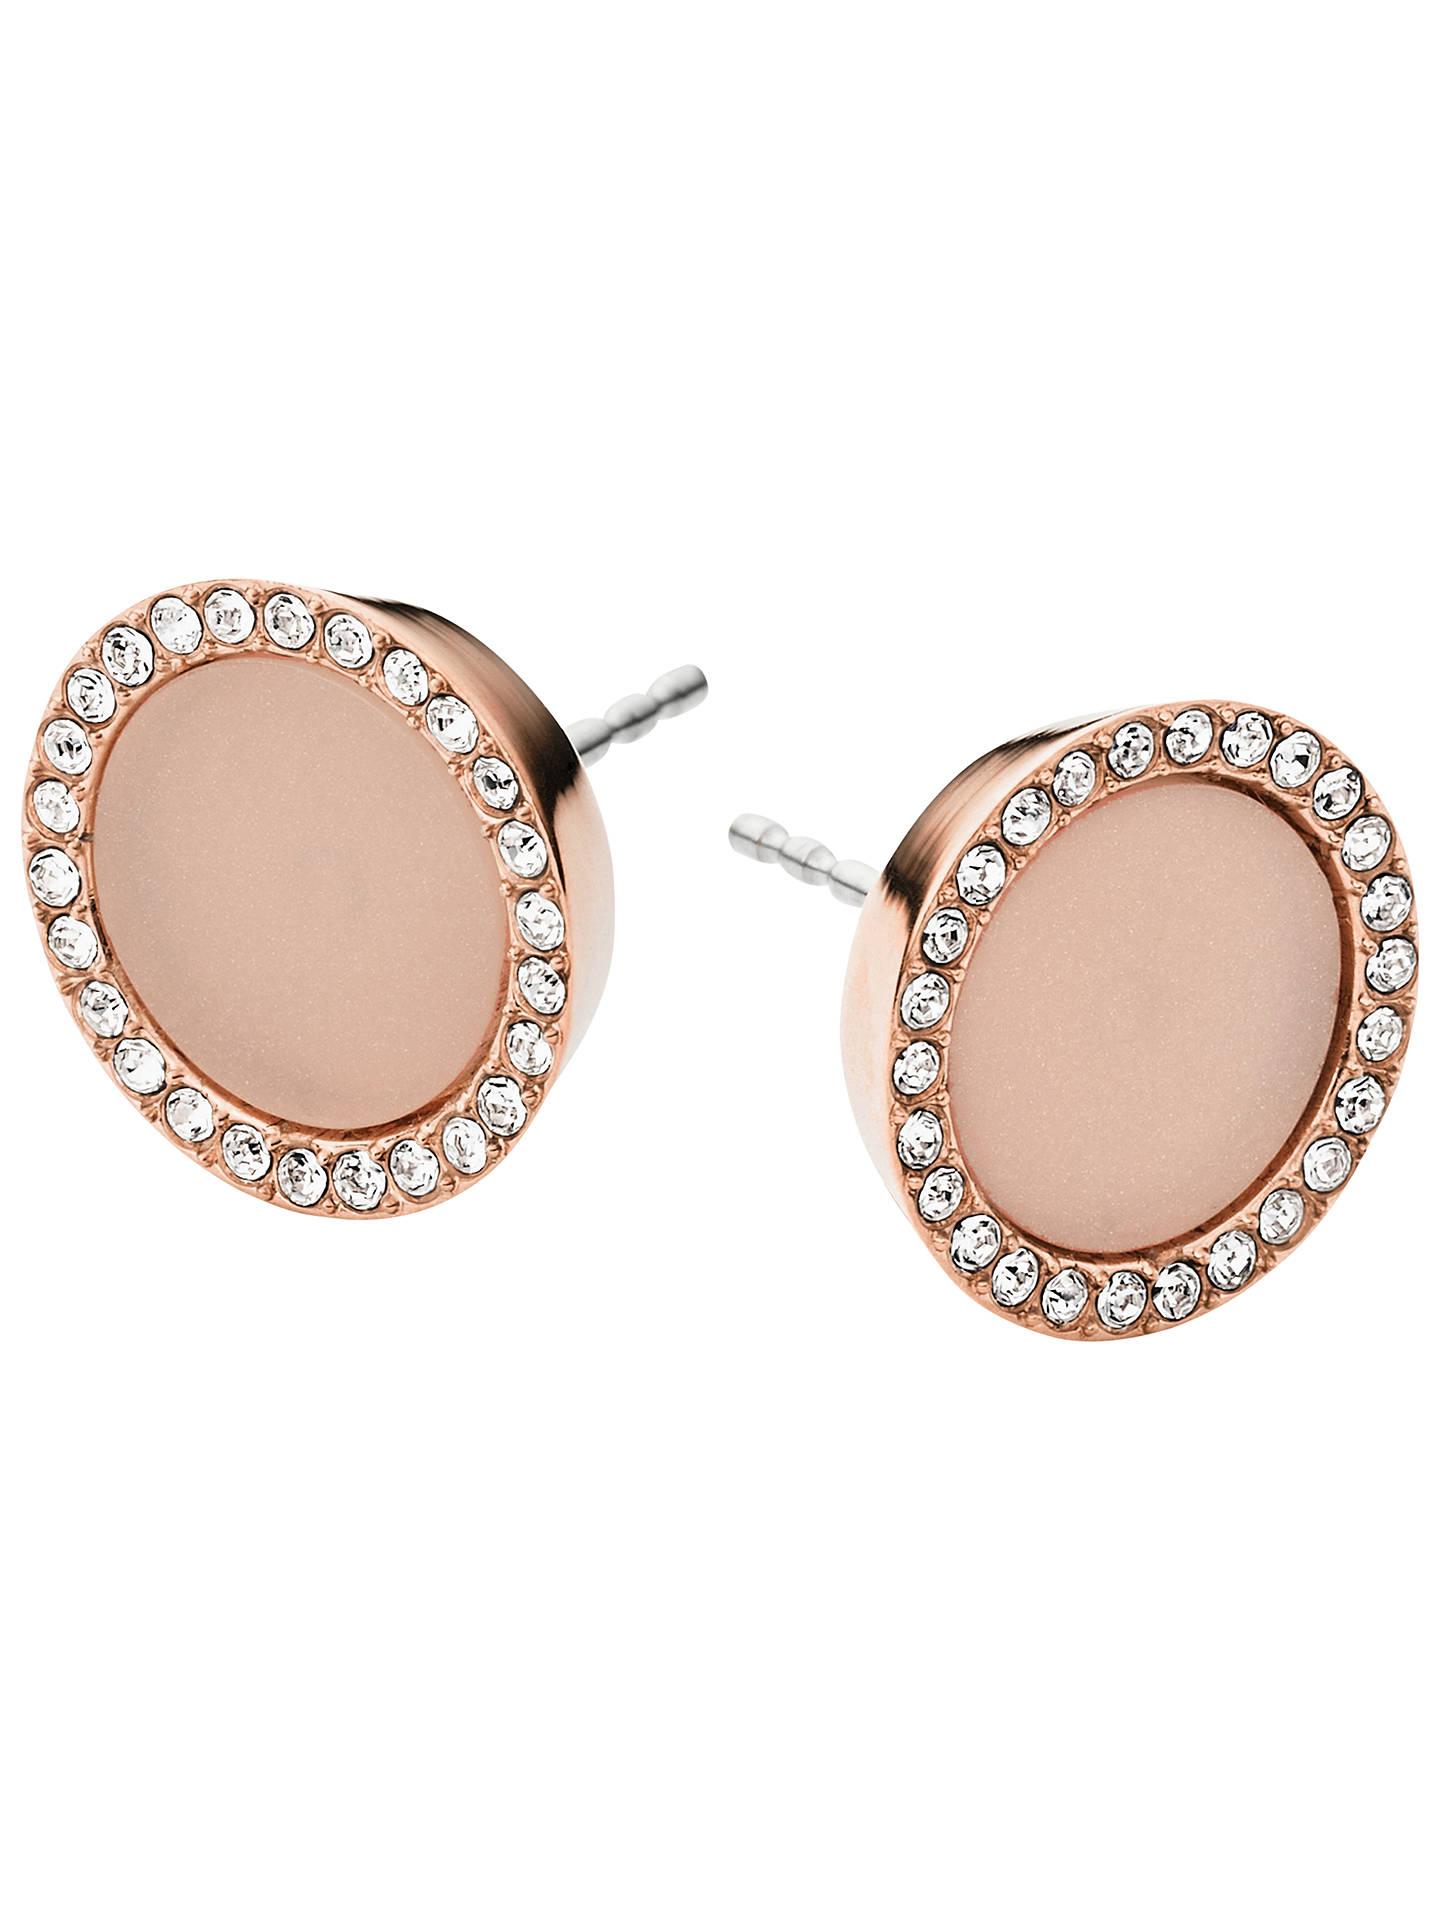 3f71cd5ce083 Buy Michael Kors Stud Earrings